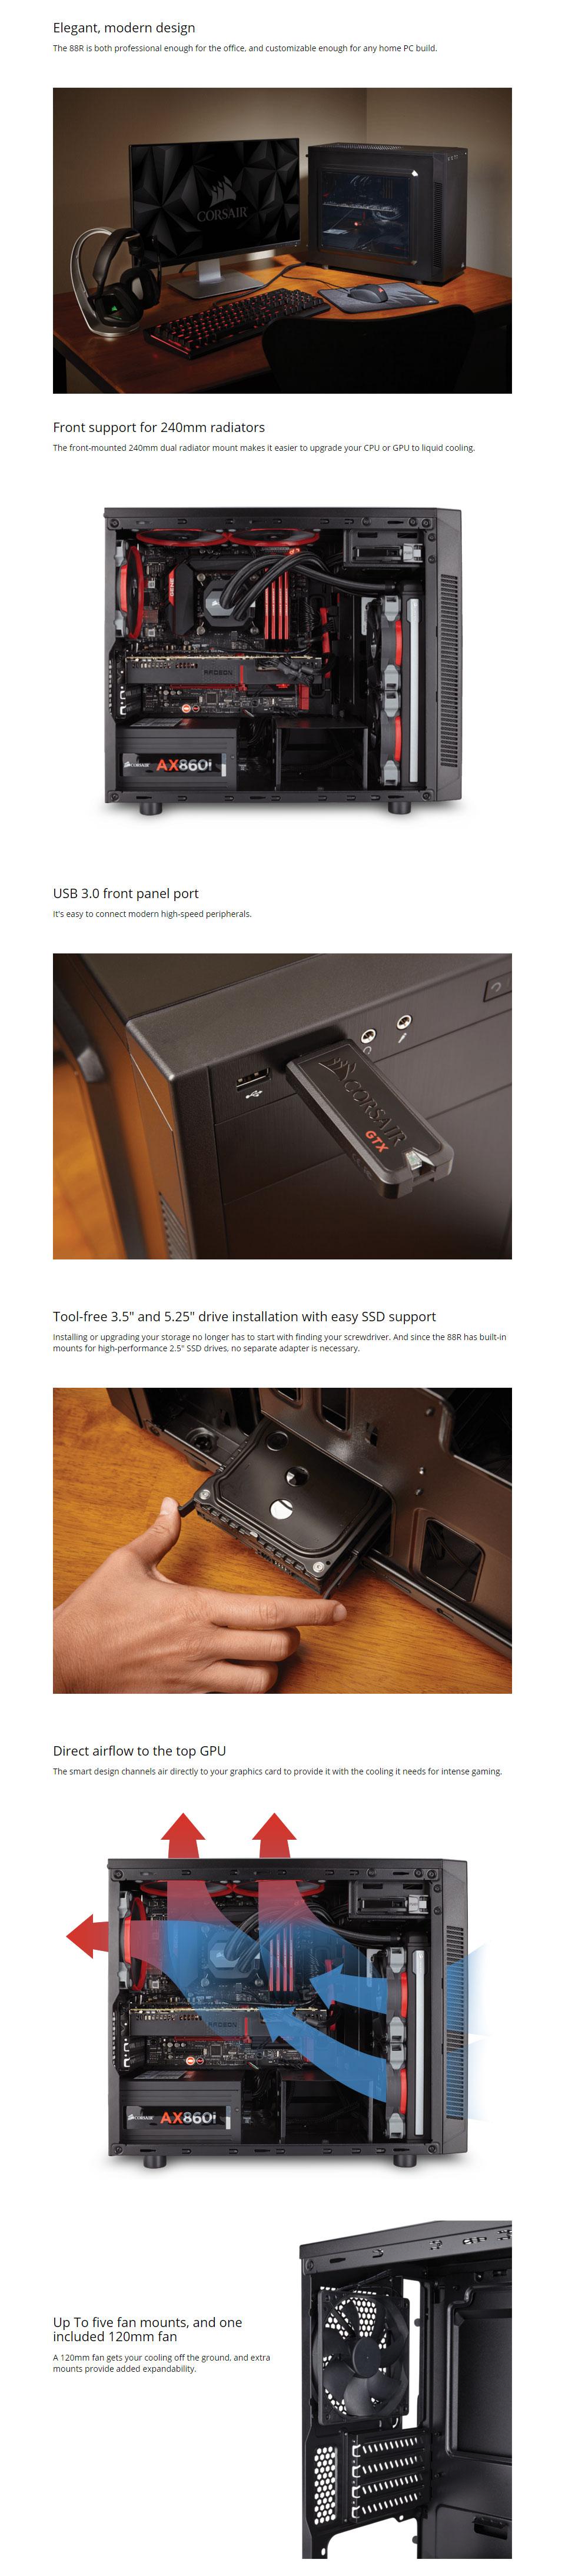 cc-9011086-ww-features-1-.jpg